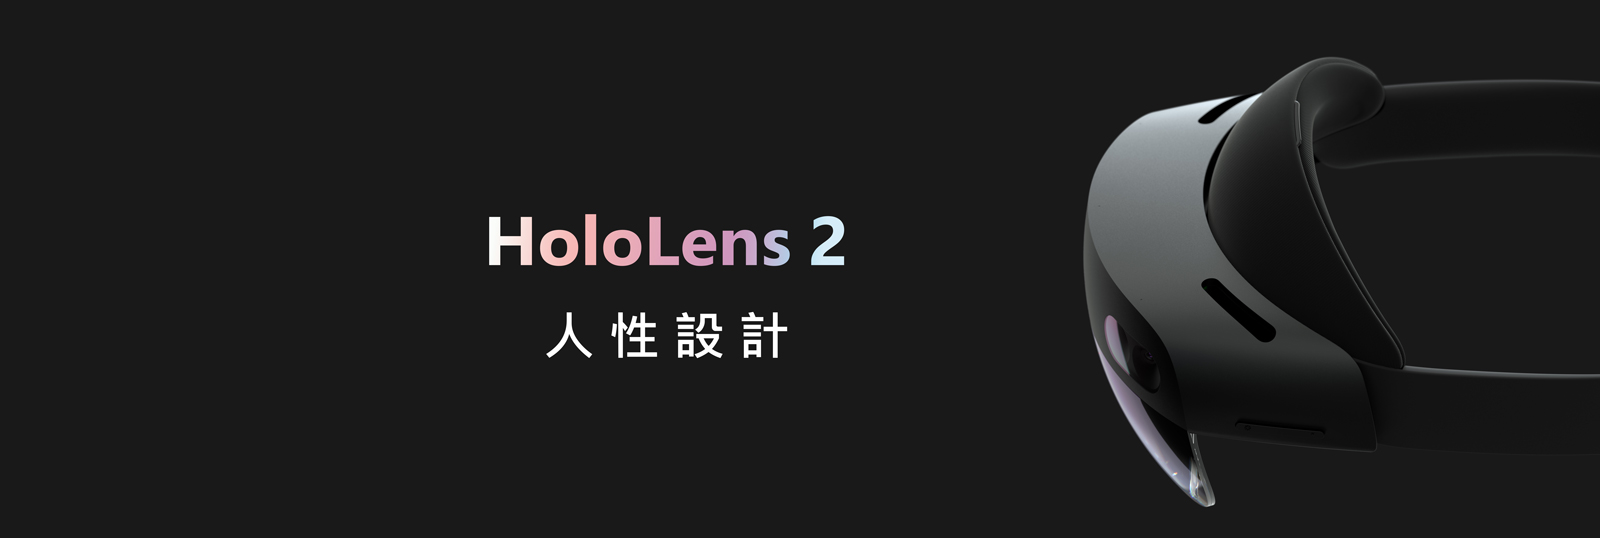 Microsoft HoloLens 2 運算新實境體驗會